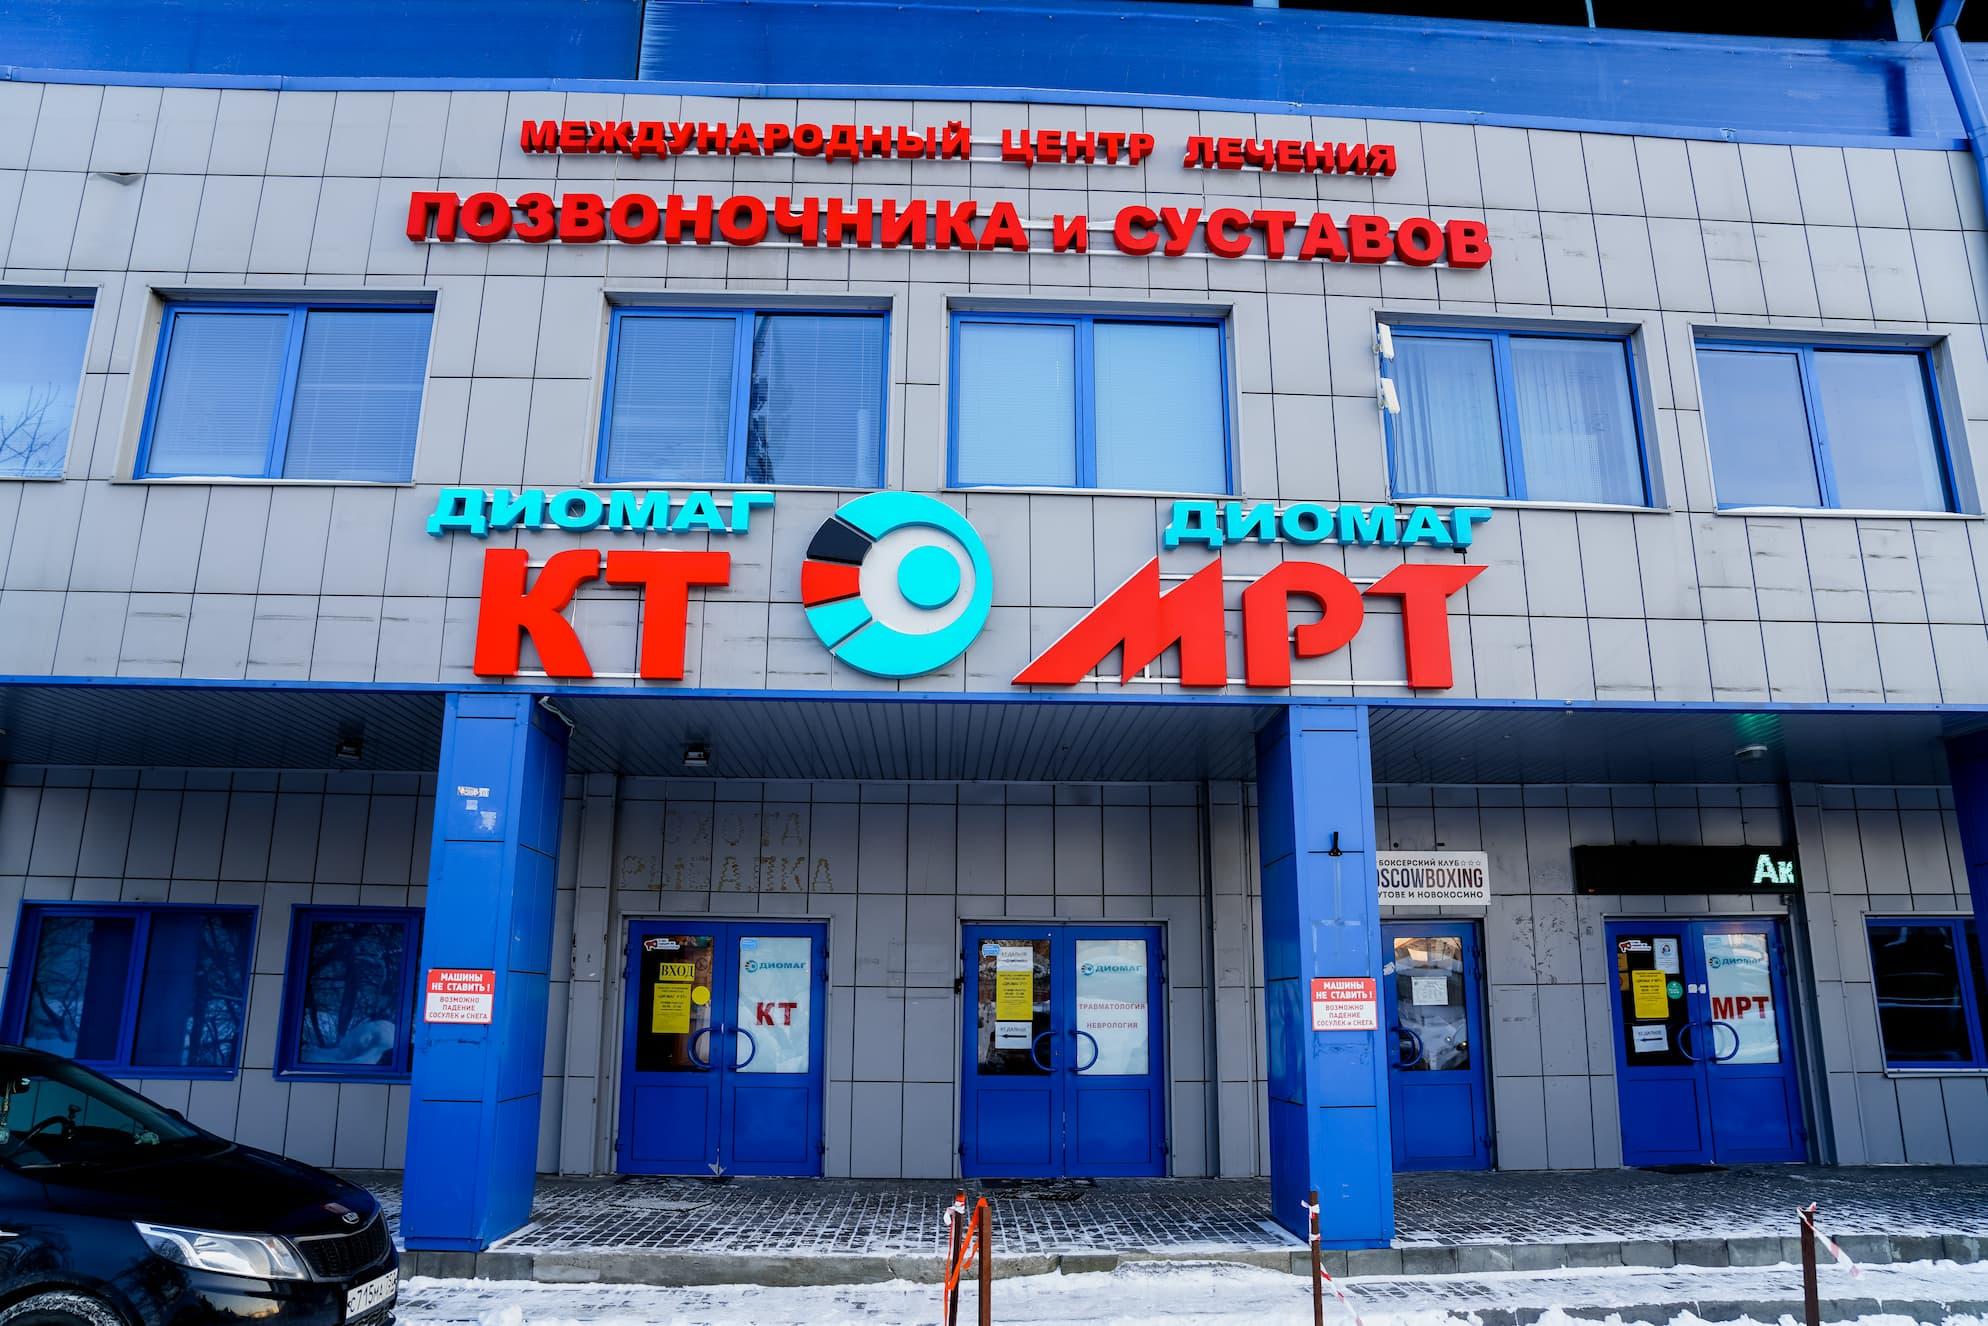 https://reutov.mrt-diomag.ru/wp-content/uploads/2021/03/fotografii_czentra.jpeg